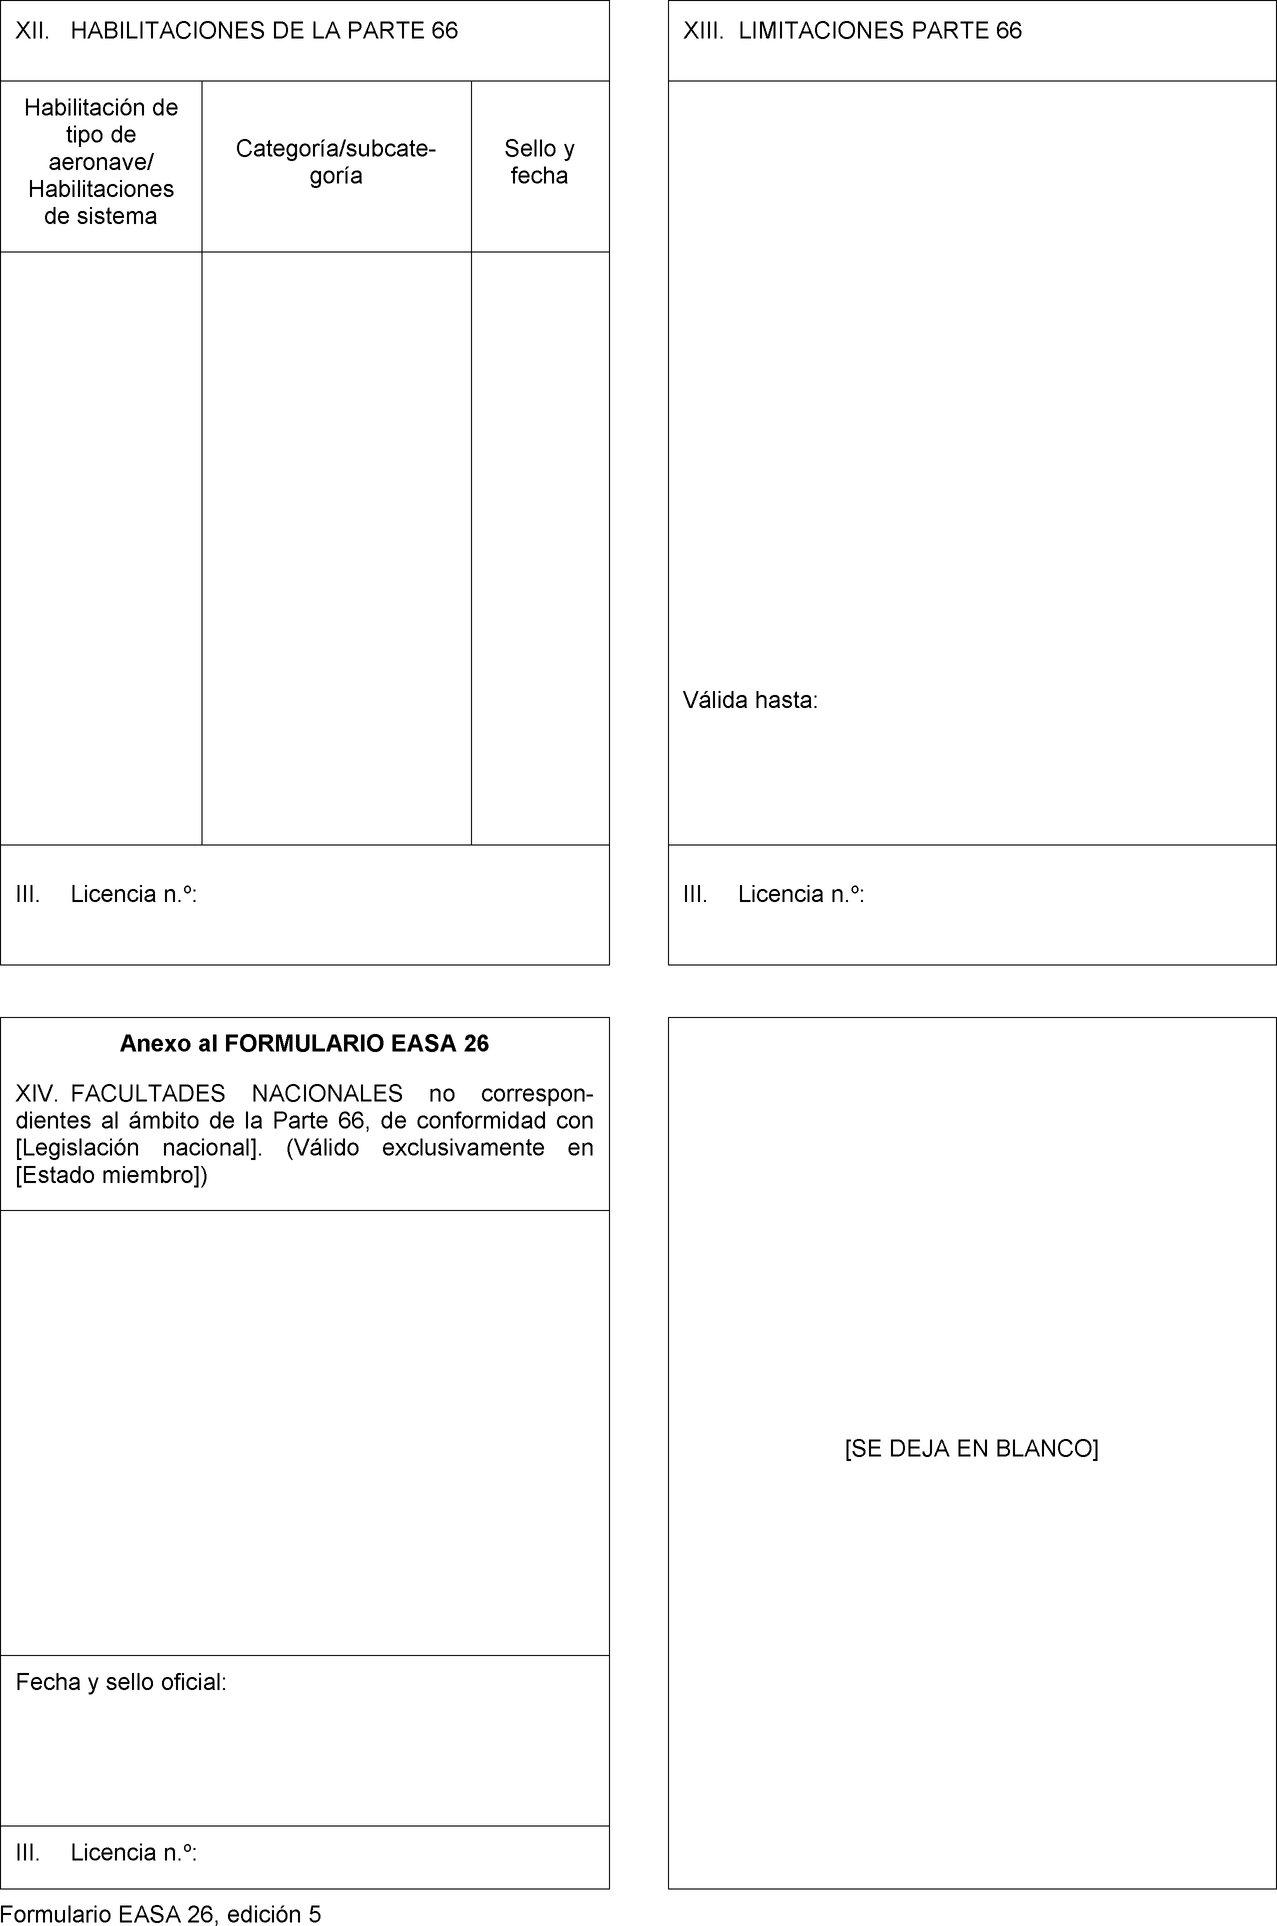 EUR-Lex - L:2018:207:FULL - ES - EUR-Lex